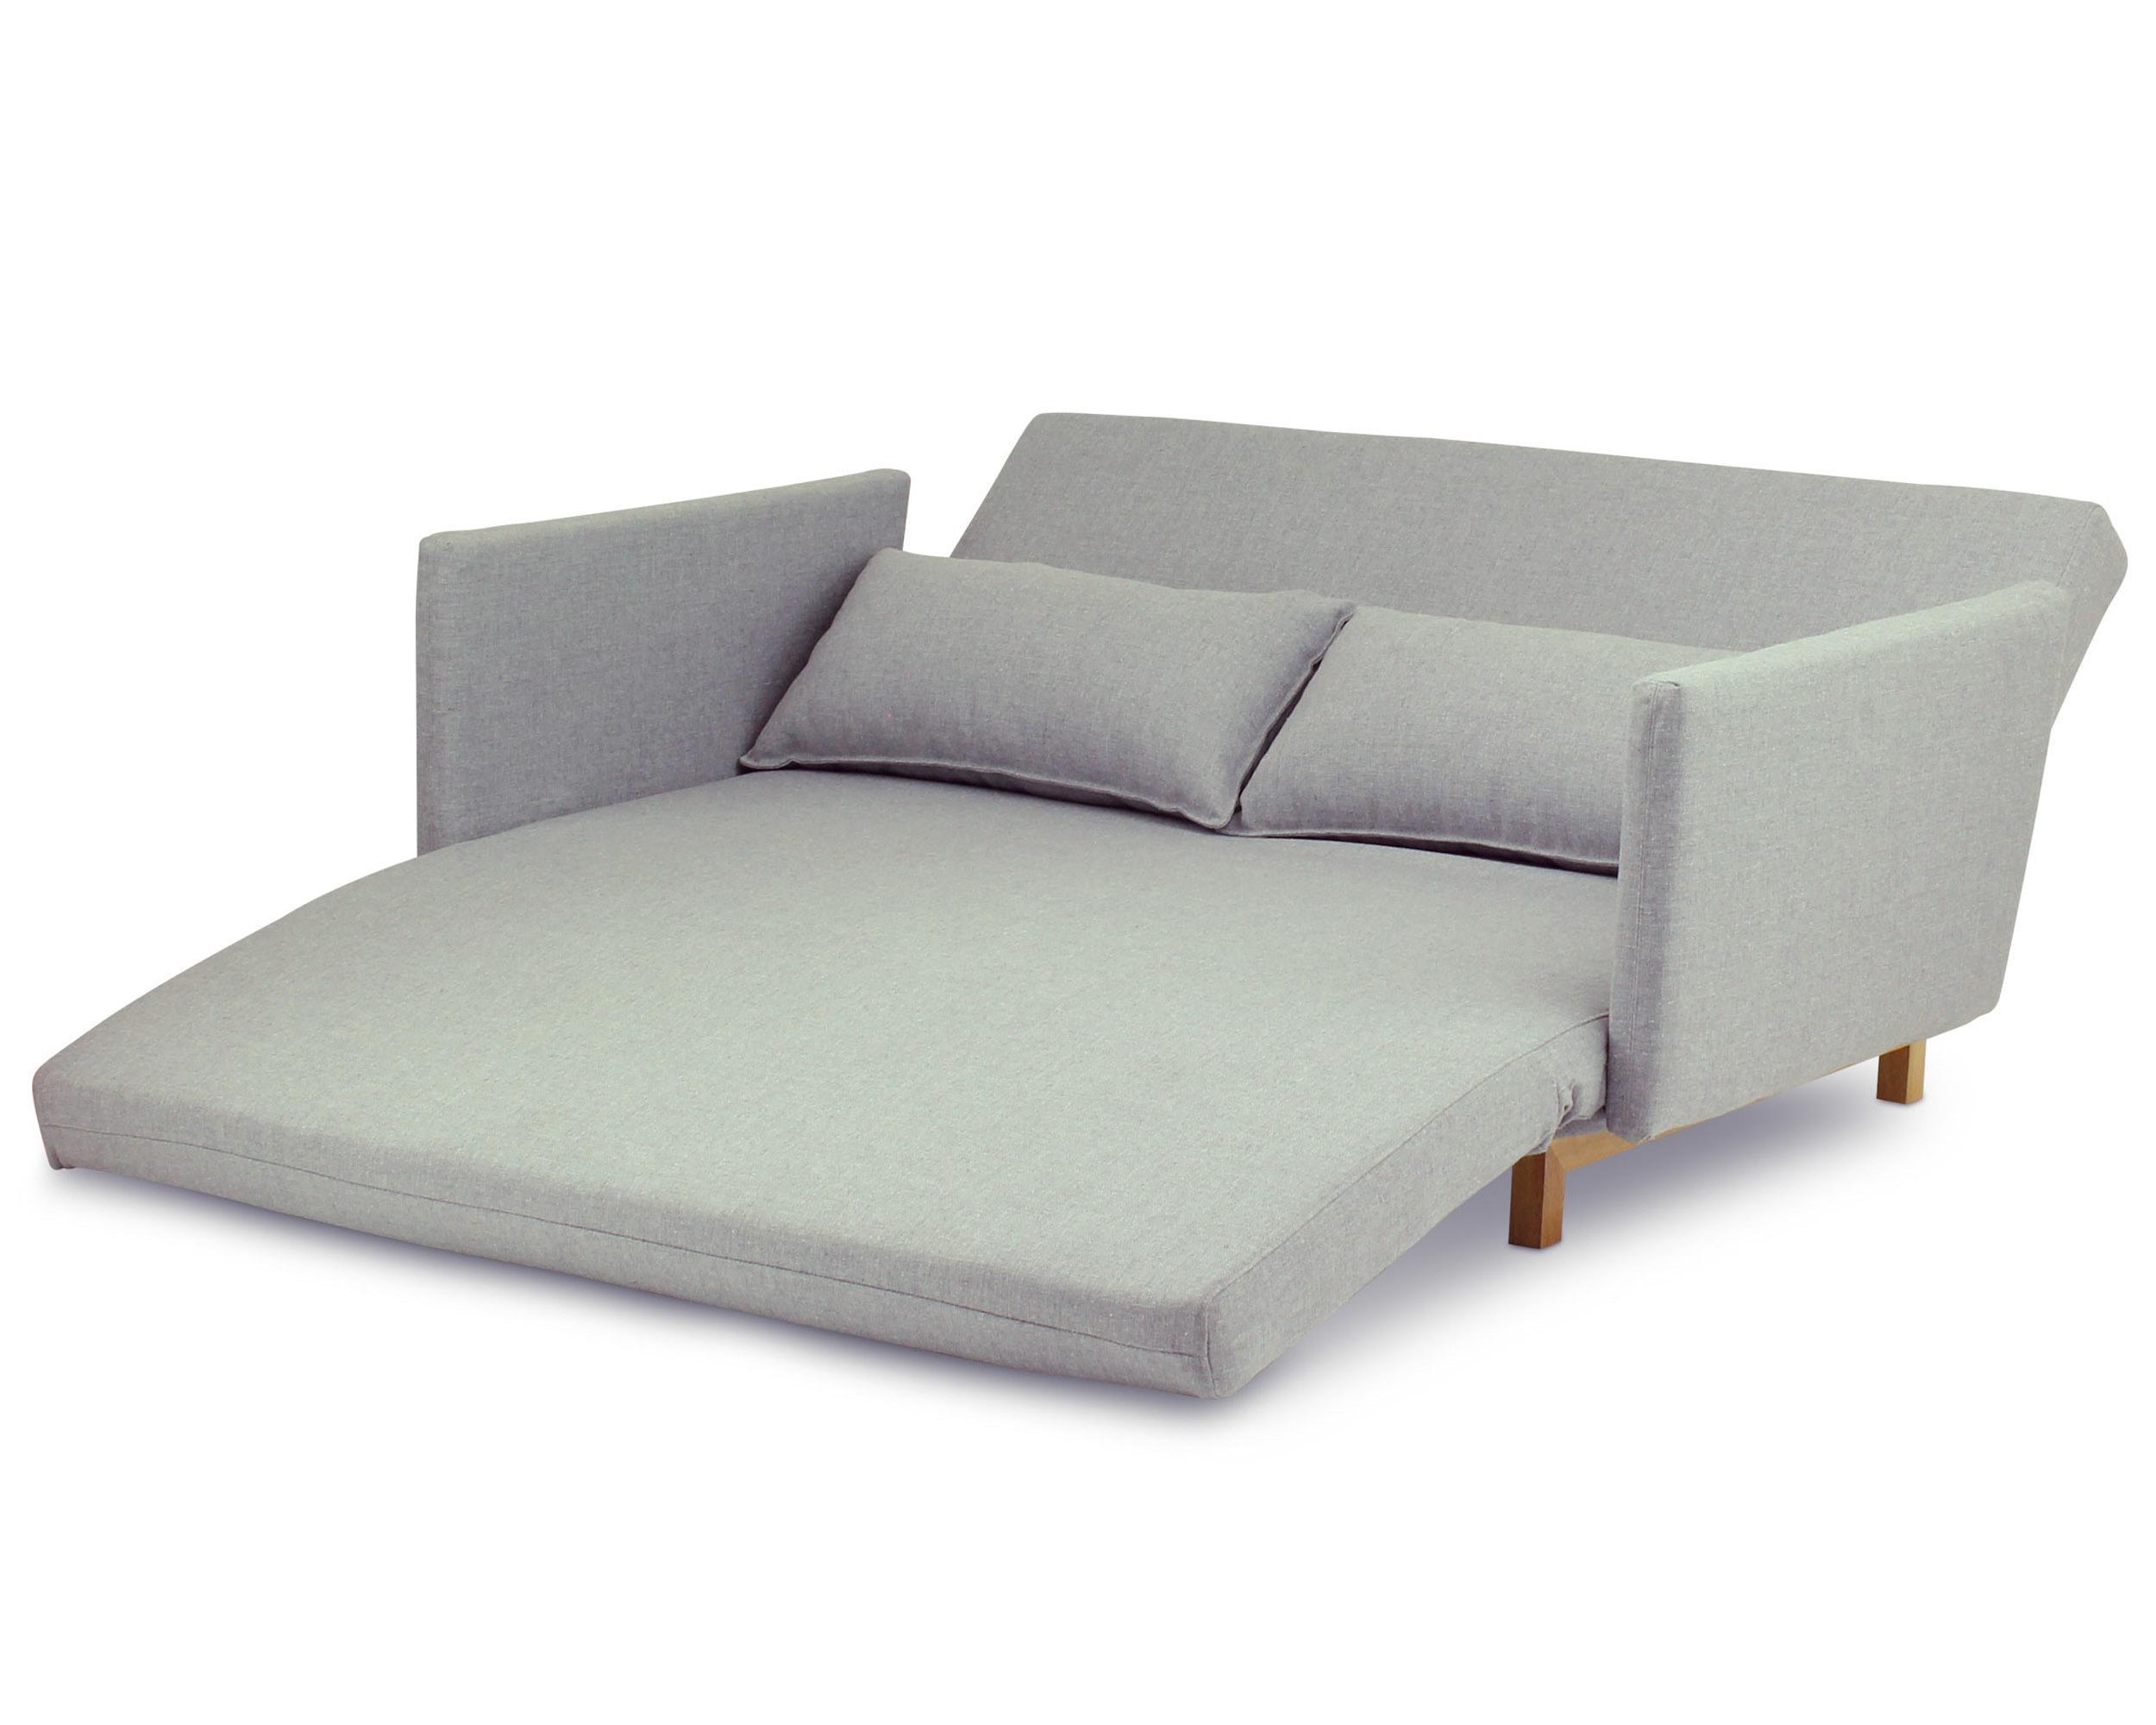 Fabric Chaise Longue Sofa Bed – Thesecretconsul Within Chaise Longue Sofa Beds (Image 7 of 20)